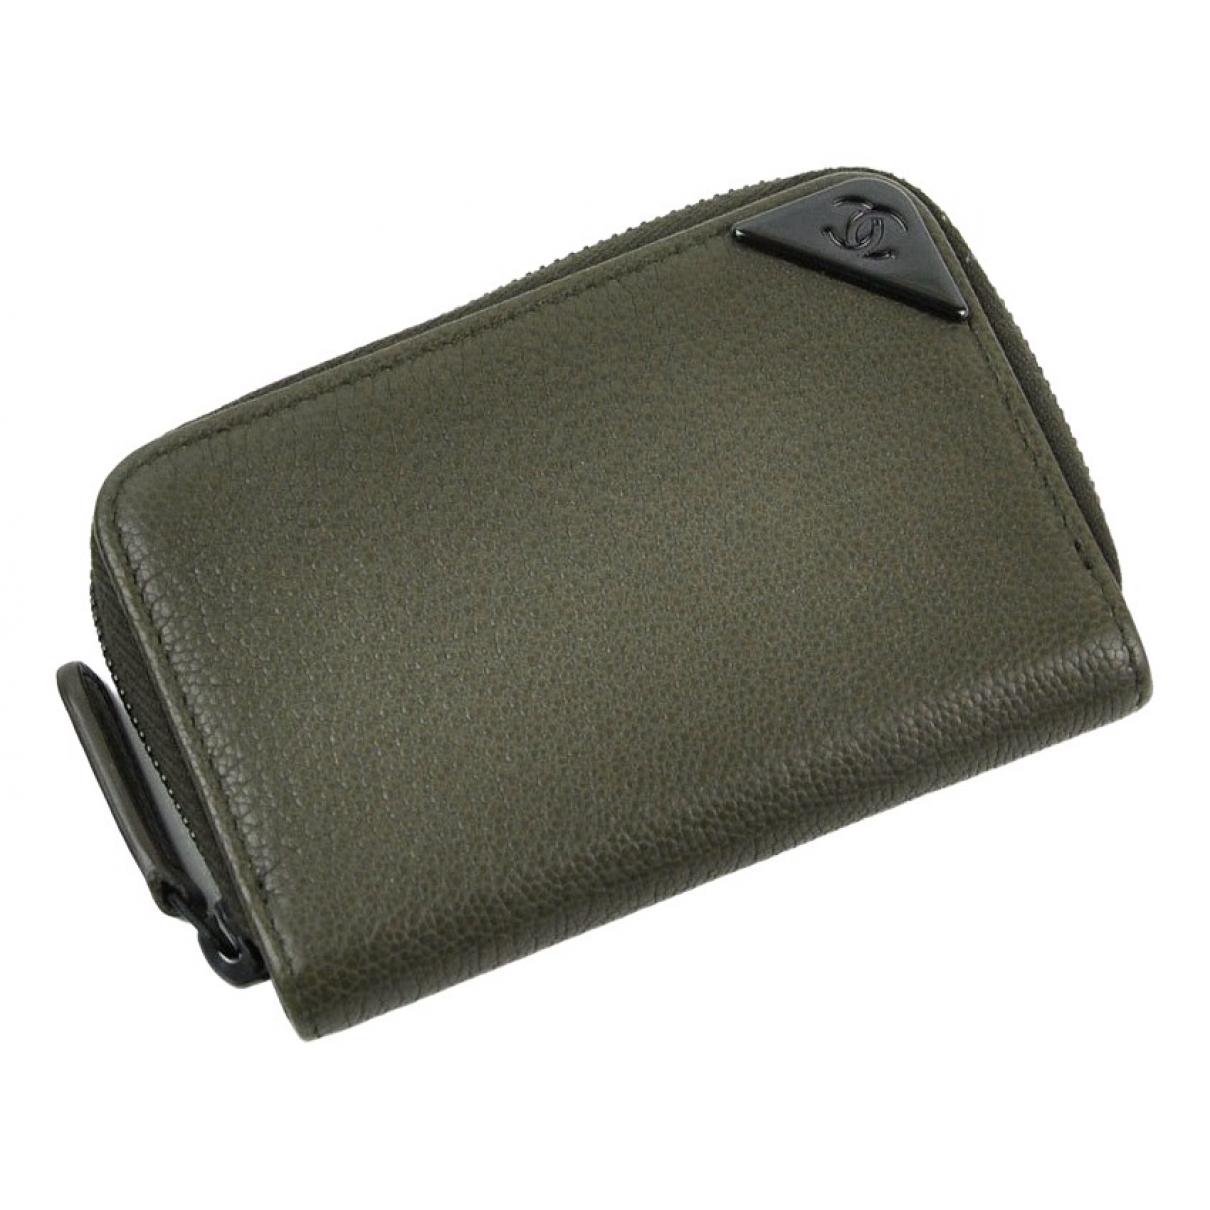 Chanel \N Green Leather wallet for Women \N